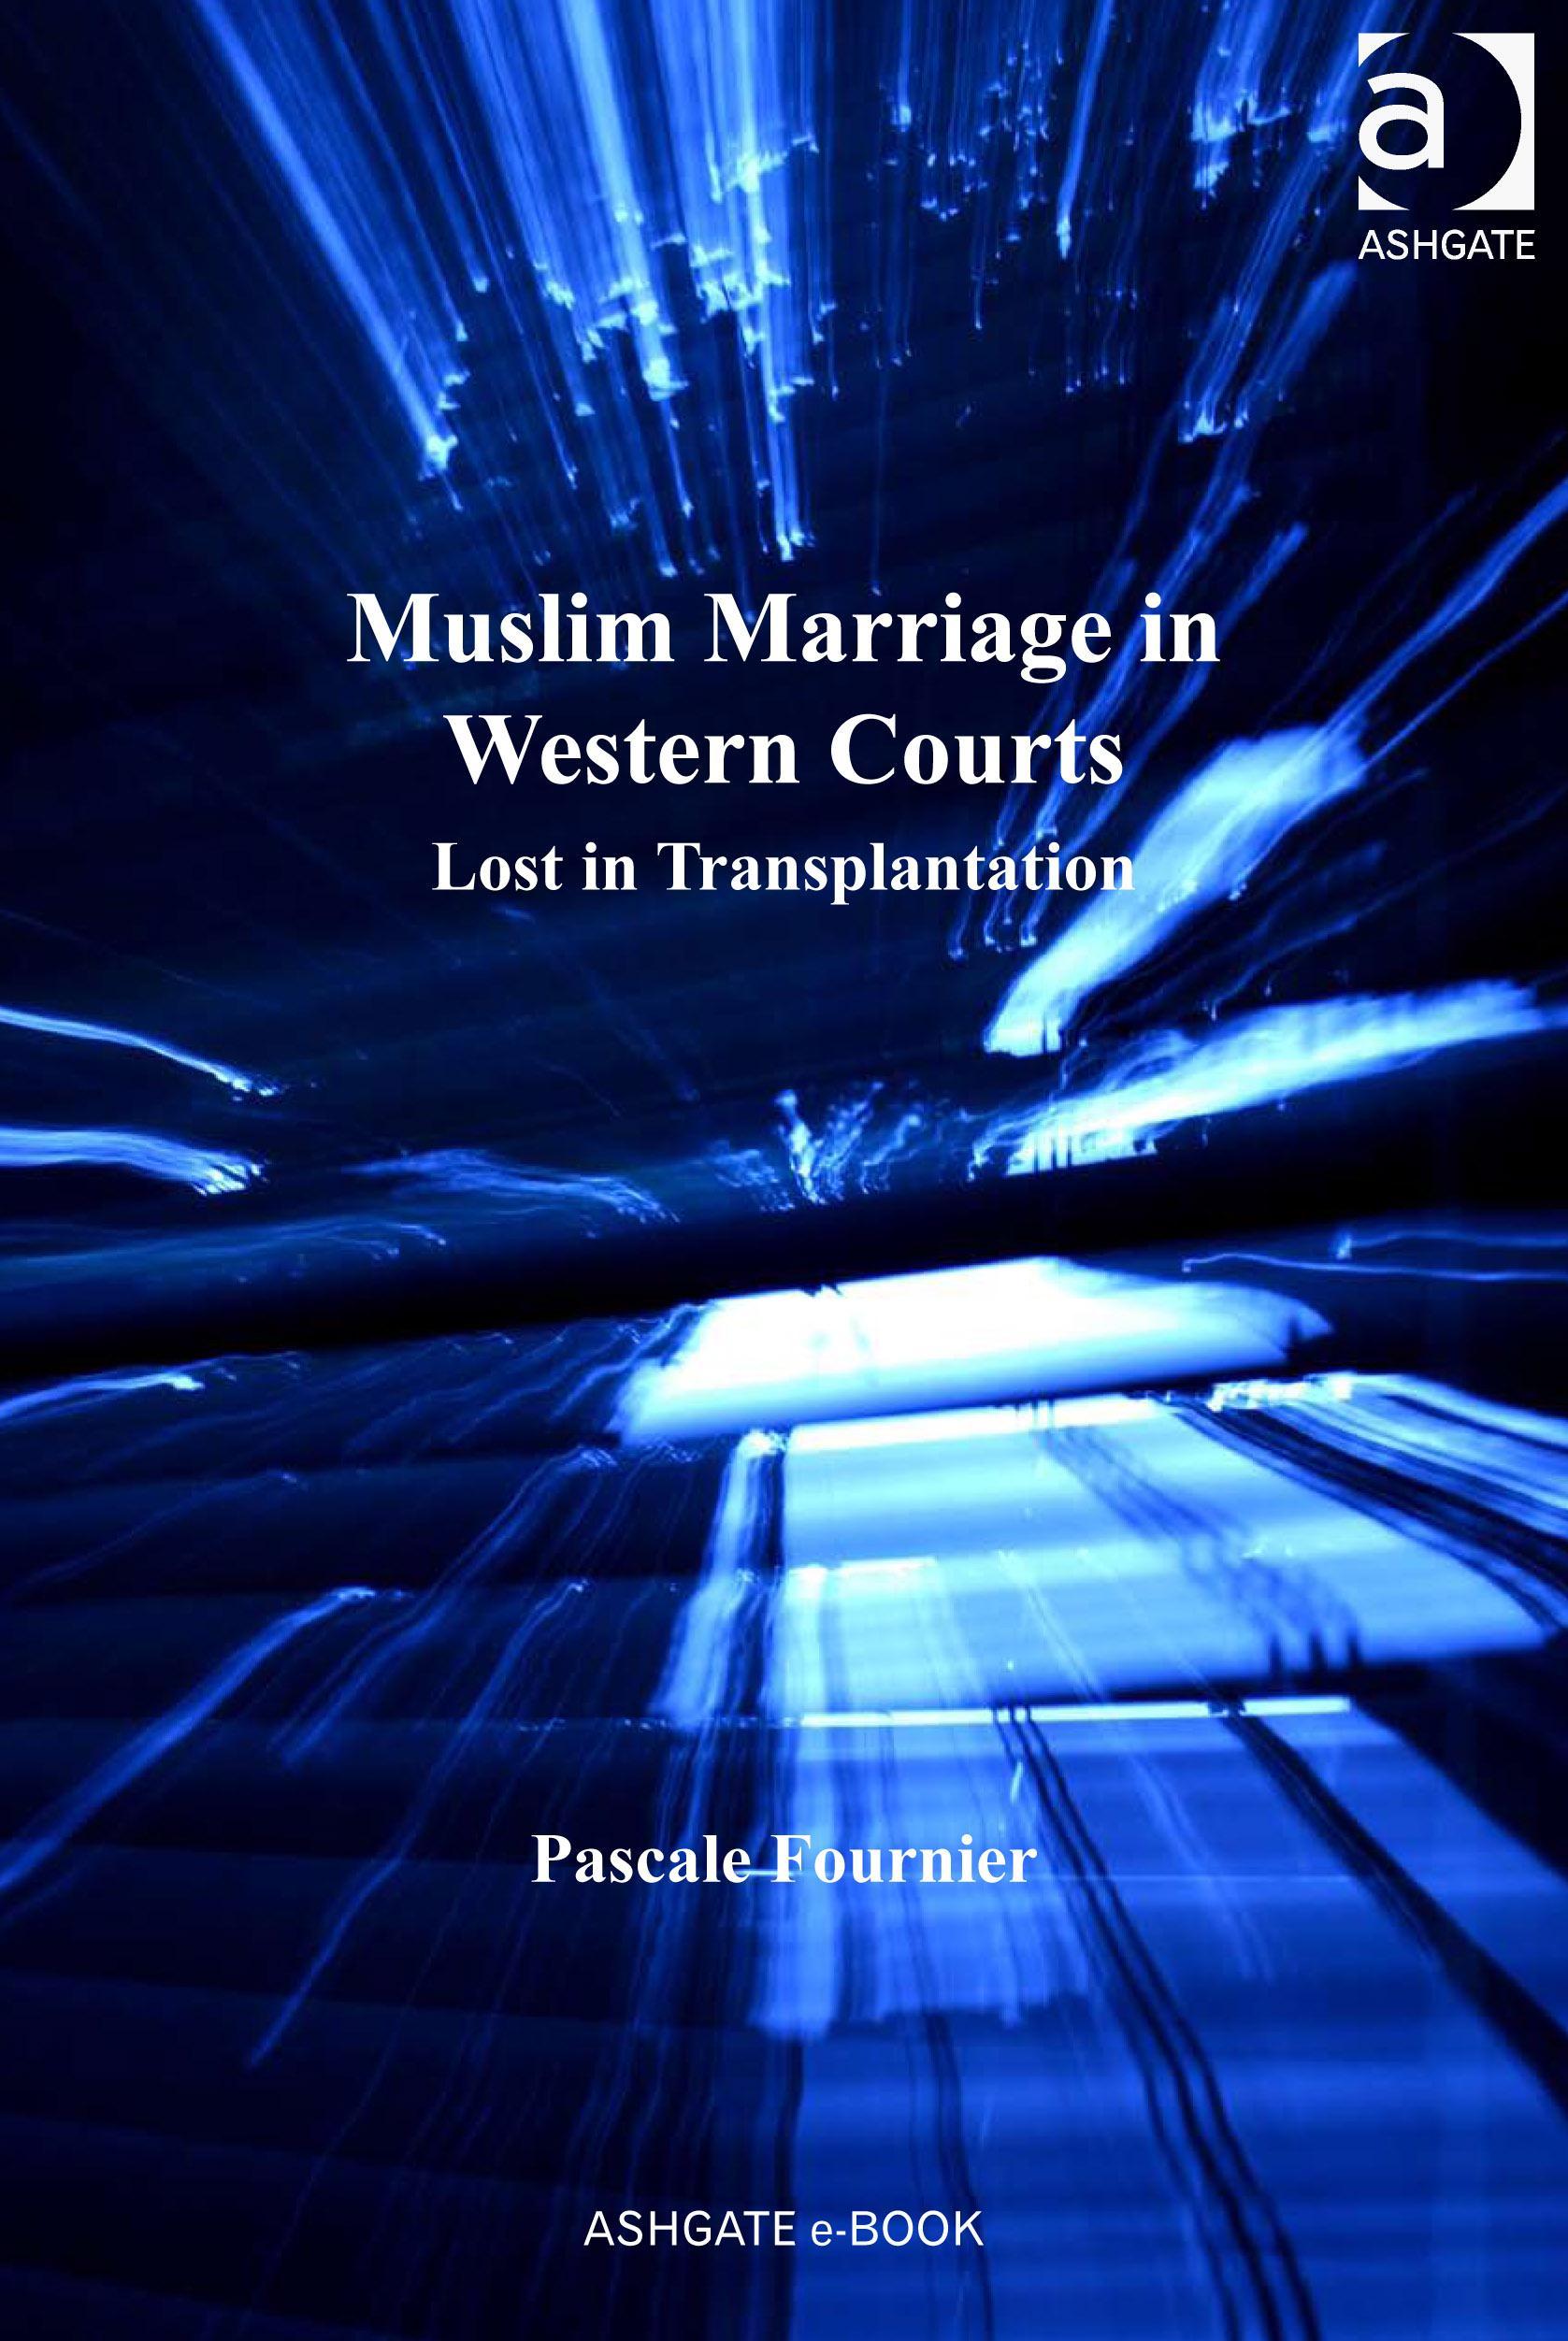 Muslim Marriage in Western Courts: Lost in Transplantation EB9781409404422